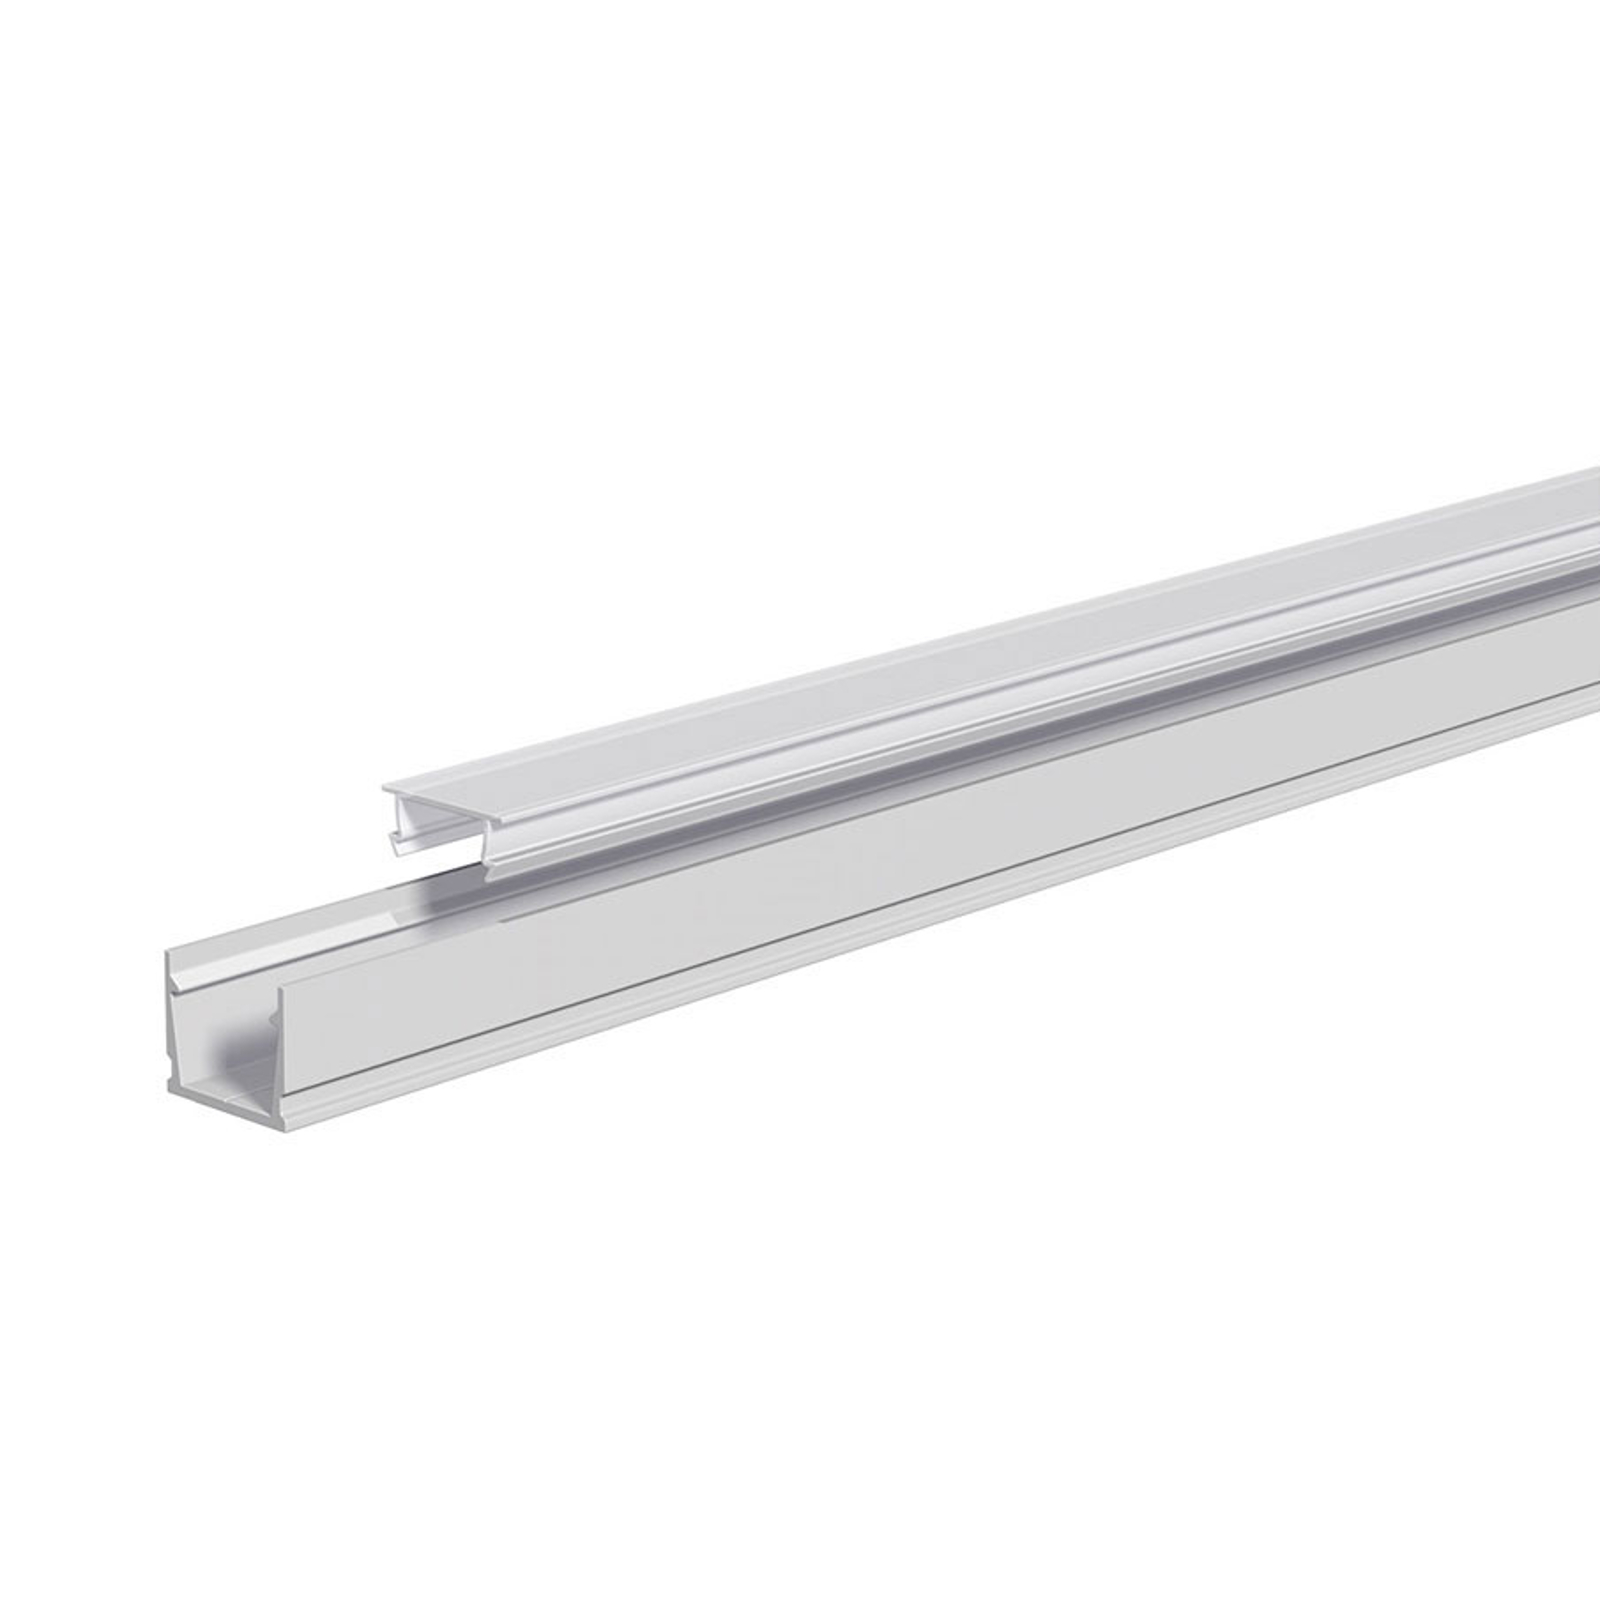 EVN APFLAT7 Alu-Profil 200cm, U-Profil, aluminium